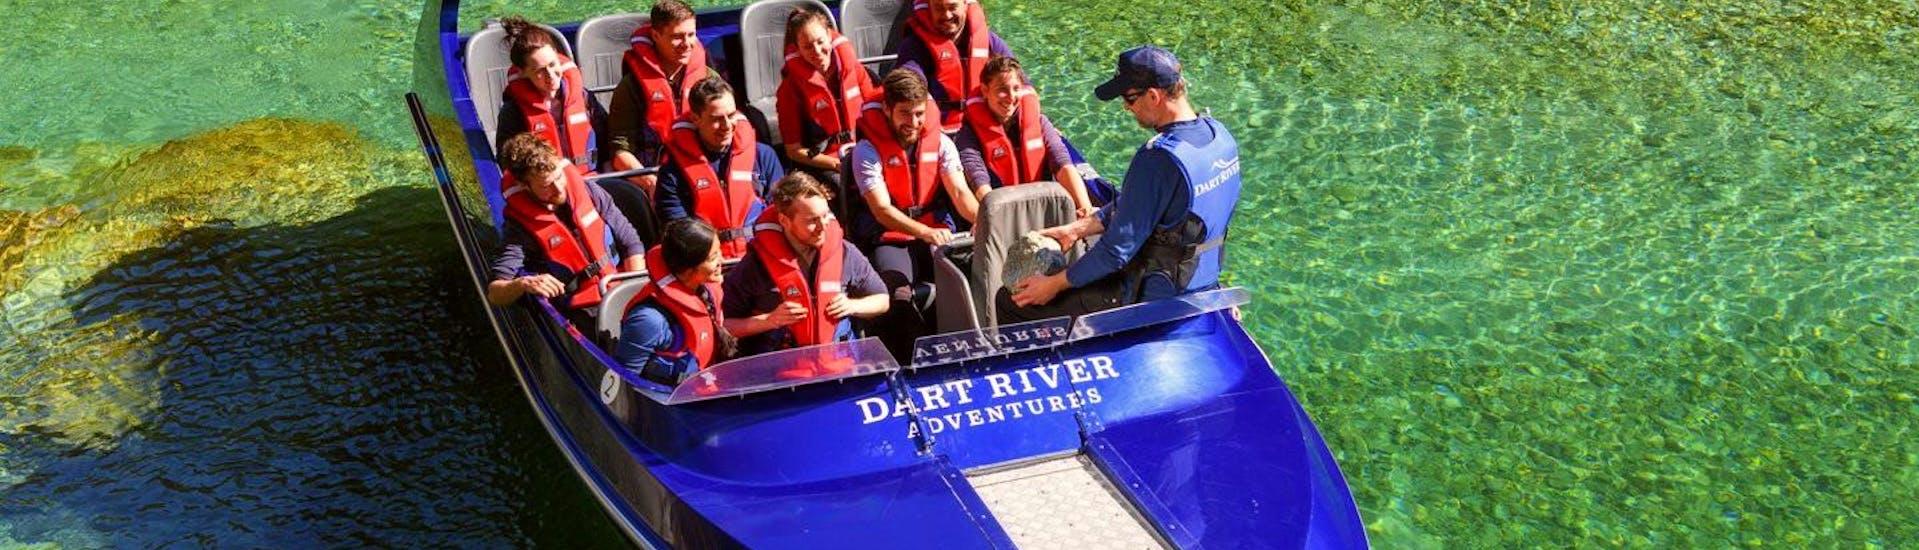 Jet Boat & Kayak in Glenorchy - Queenstown Transfer